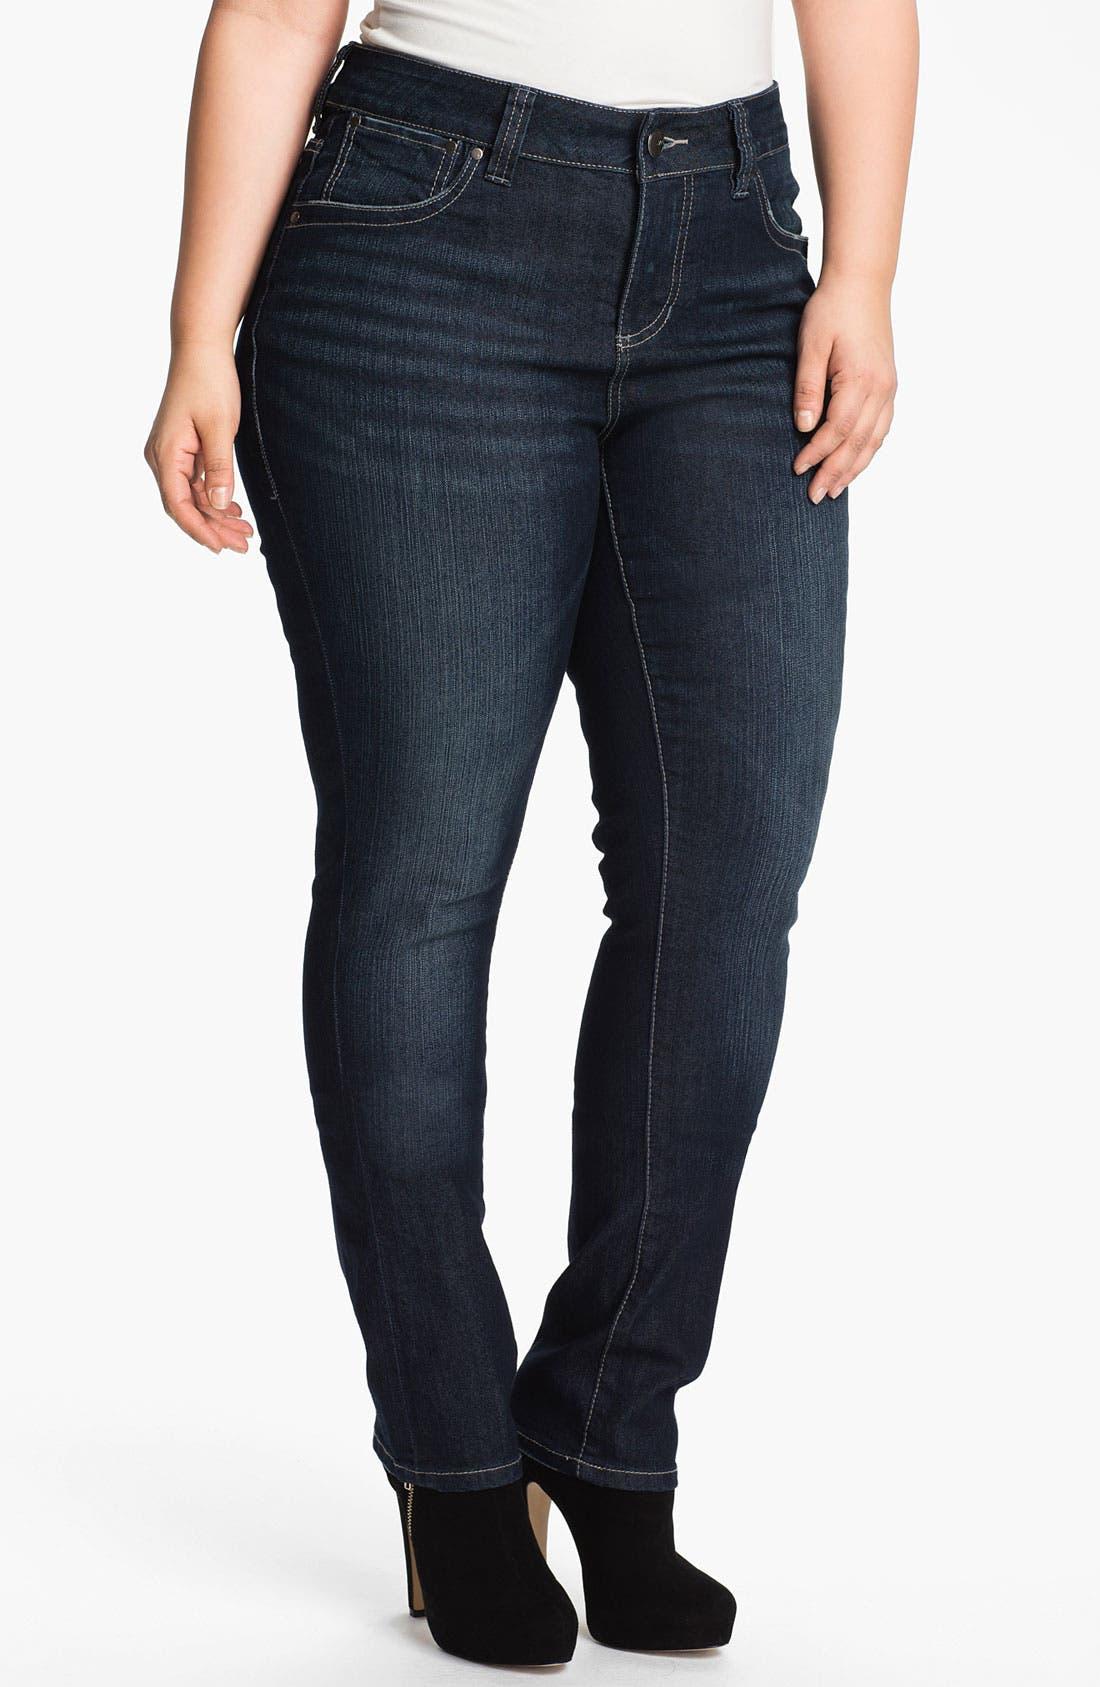 Main Image - Jag Jeans 'Bevin' Slim Stretch Jeans (Plus Size)